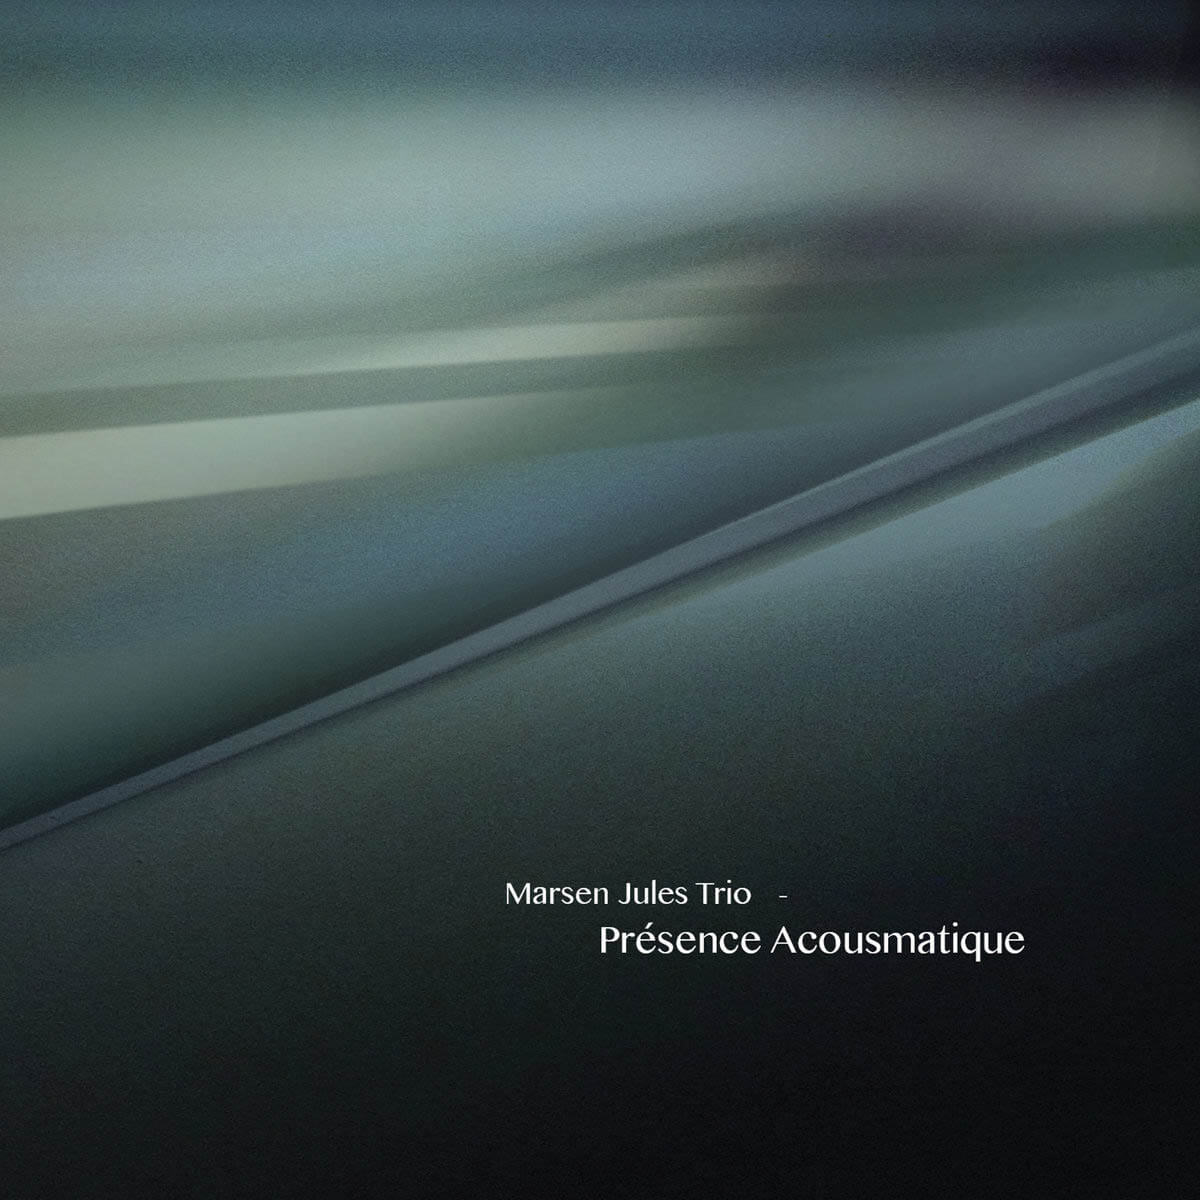 marsen jules trio presence acousmatique CD